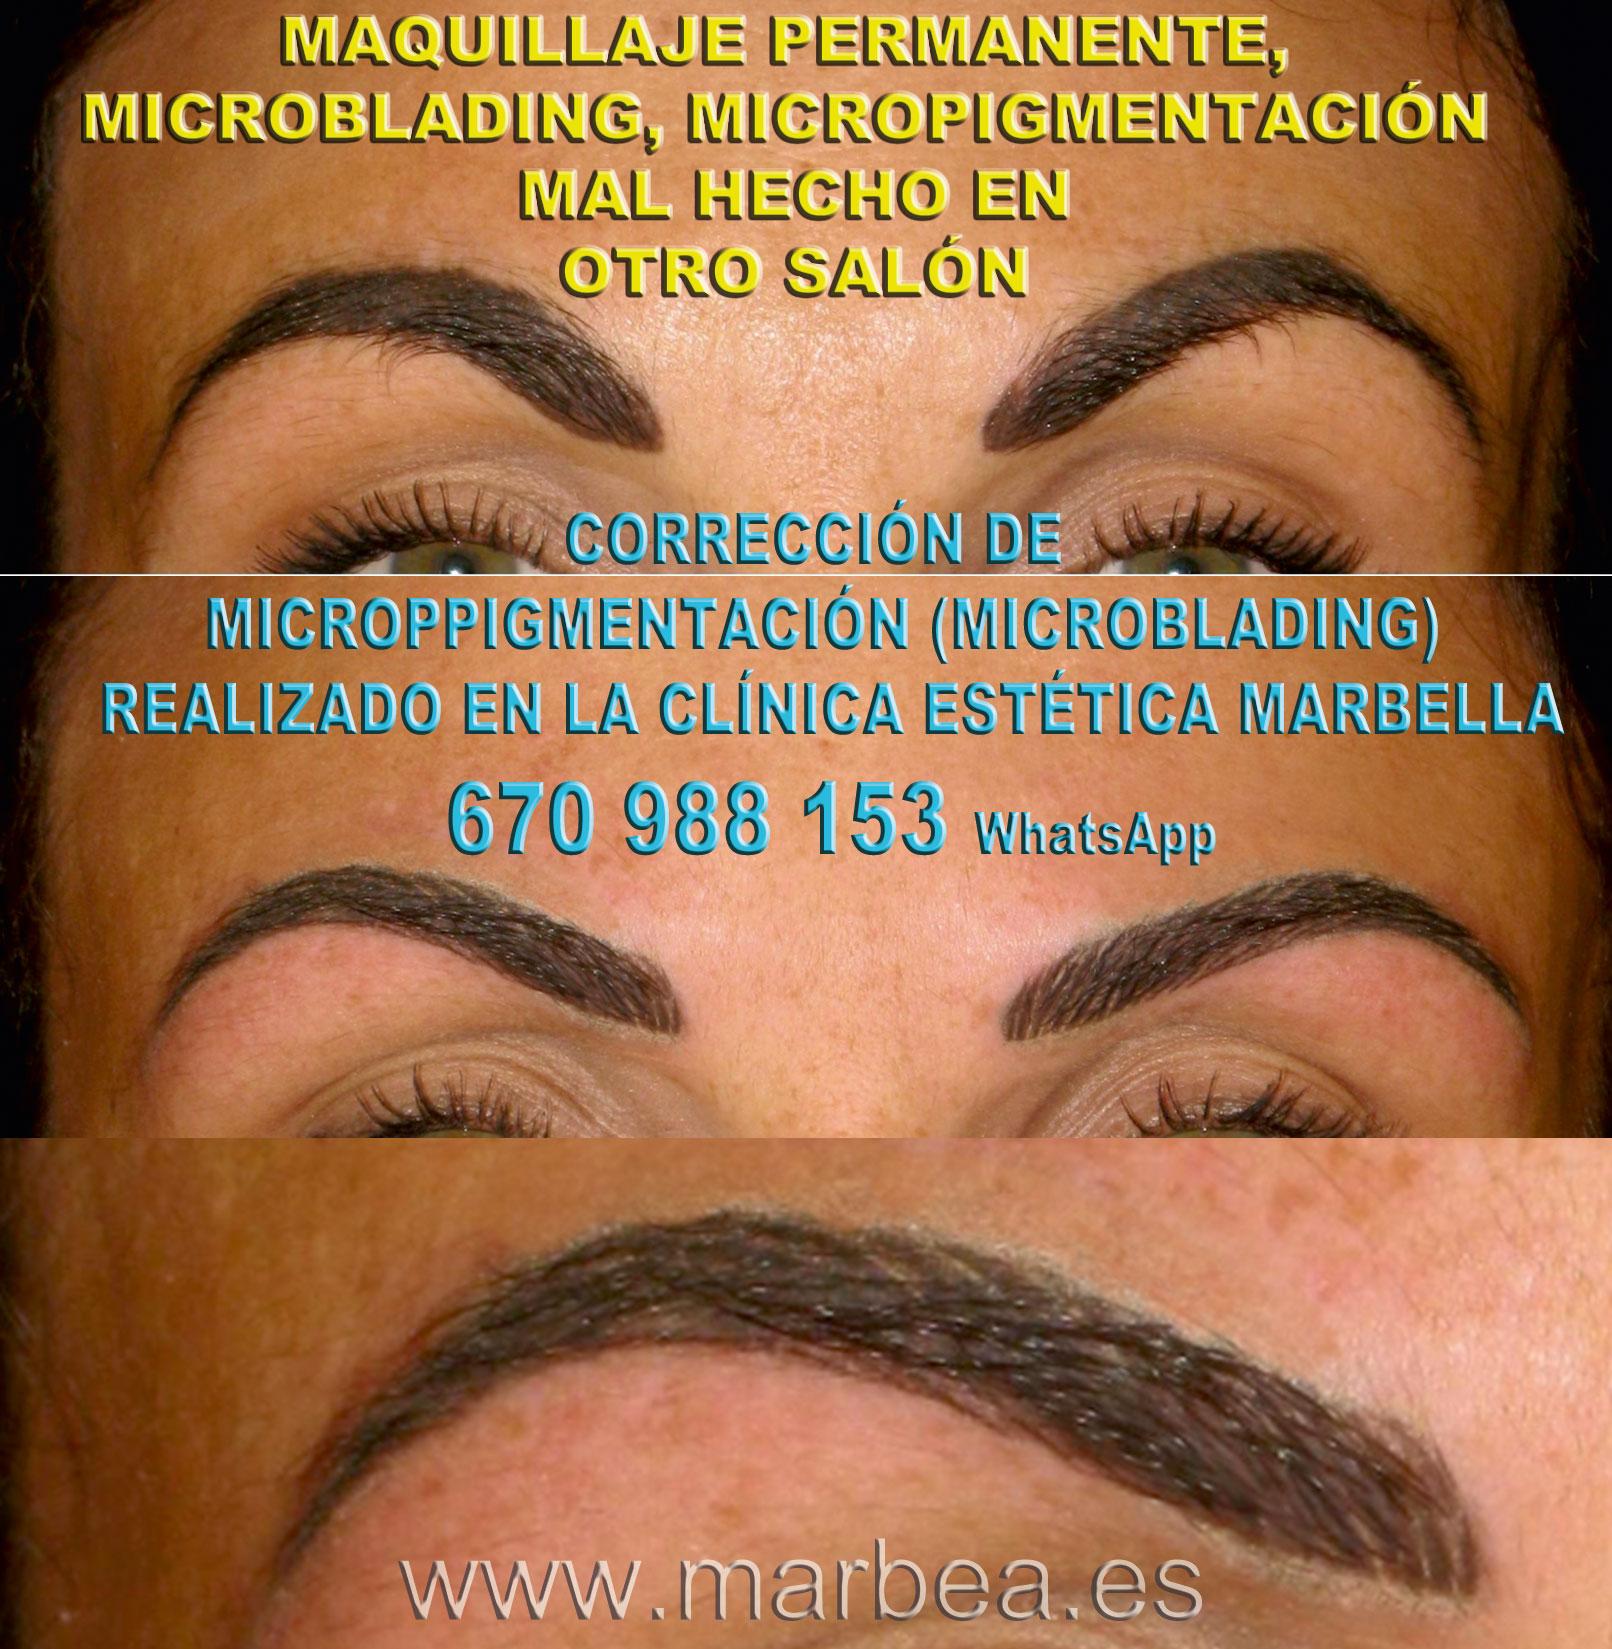 CORREGIR TATUAJE DE CEJAS clínica estética micropigmentación ofrece corrección de micropigmentación en cejas,corregir micropigmentación mal hecha